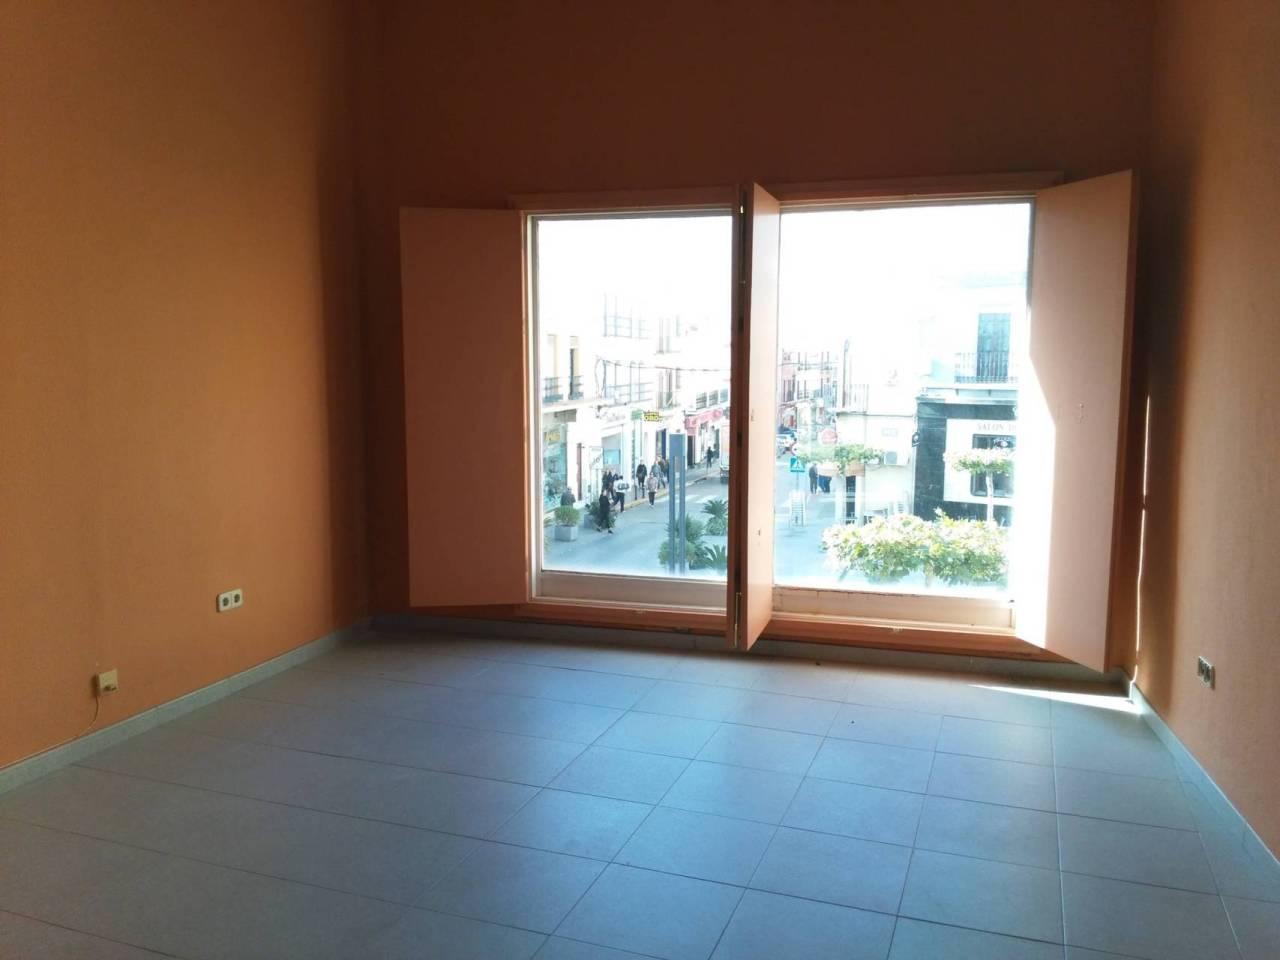 Local en alquiler con 80 m2,  en Alcalá de Guadaíra, CENTRO